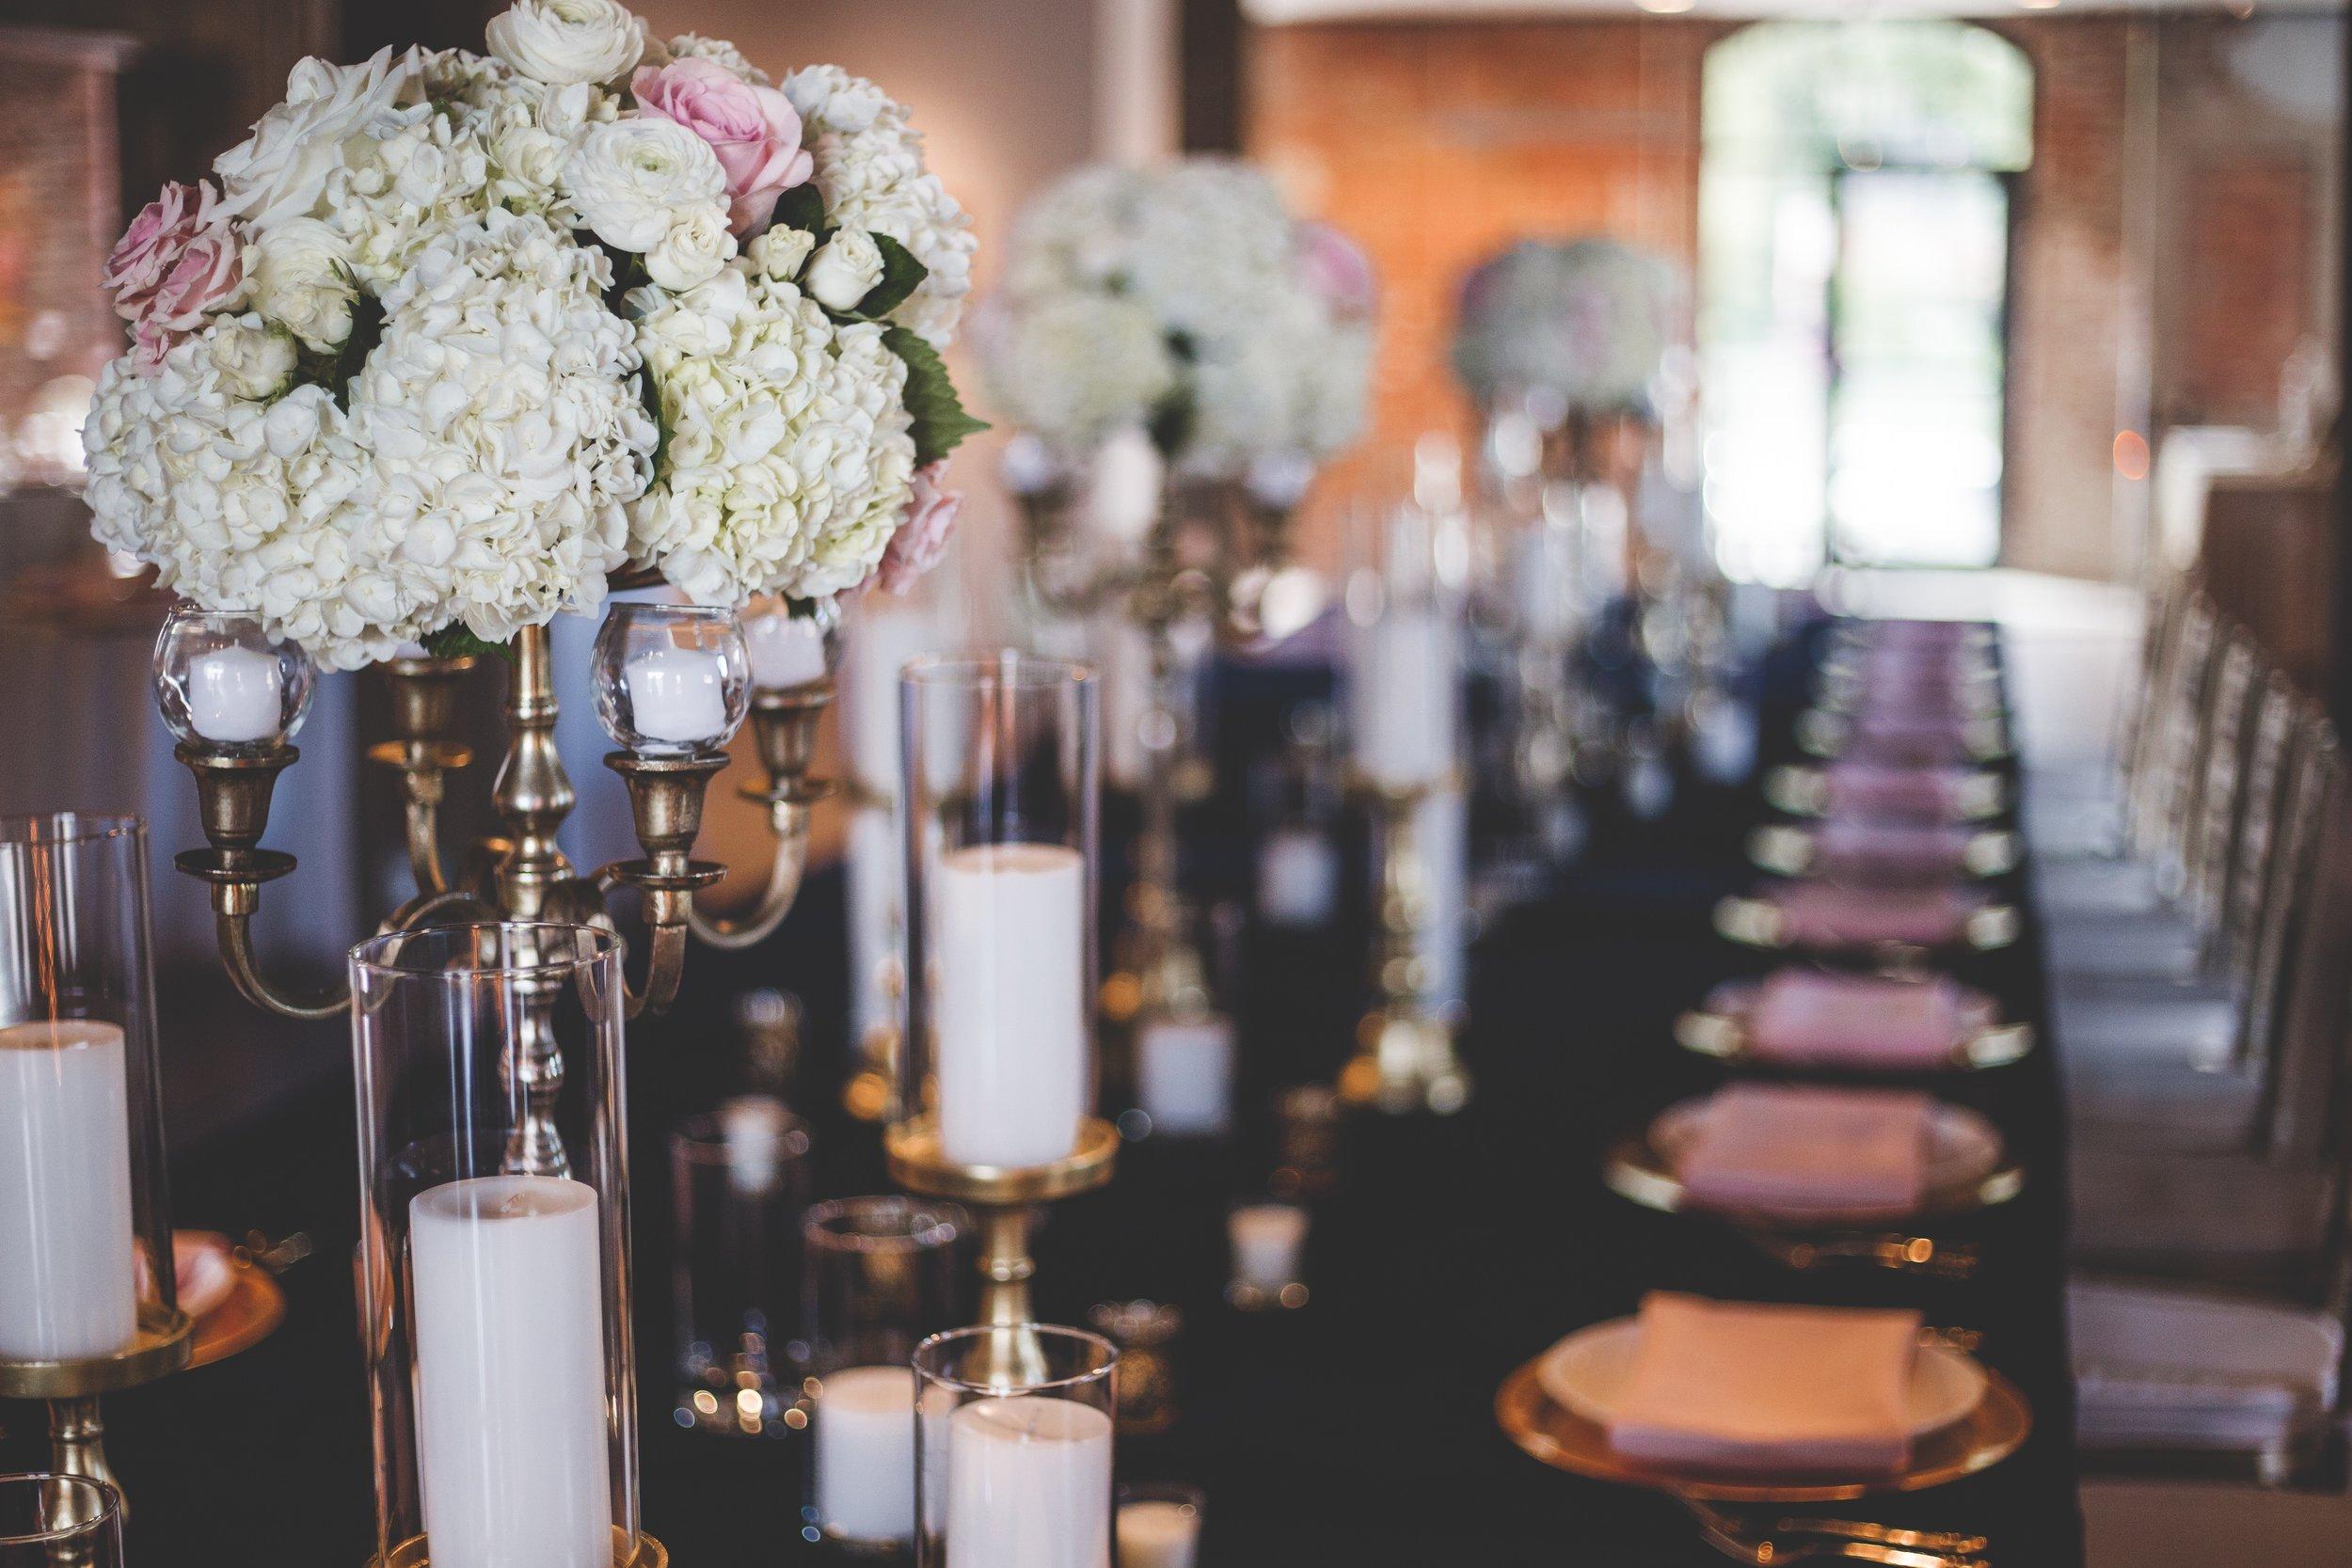 cider-gallery-lawrence-ks-wedding-photographer-jason-domingues-photography-lindsey-paul-0279.jpg